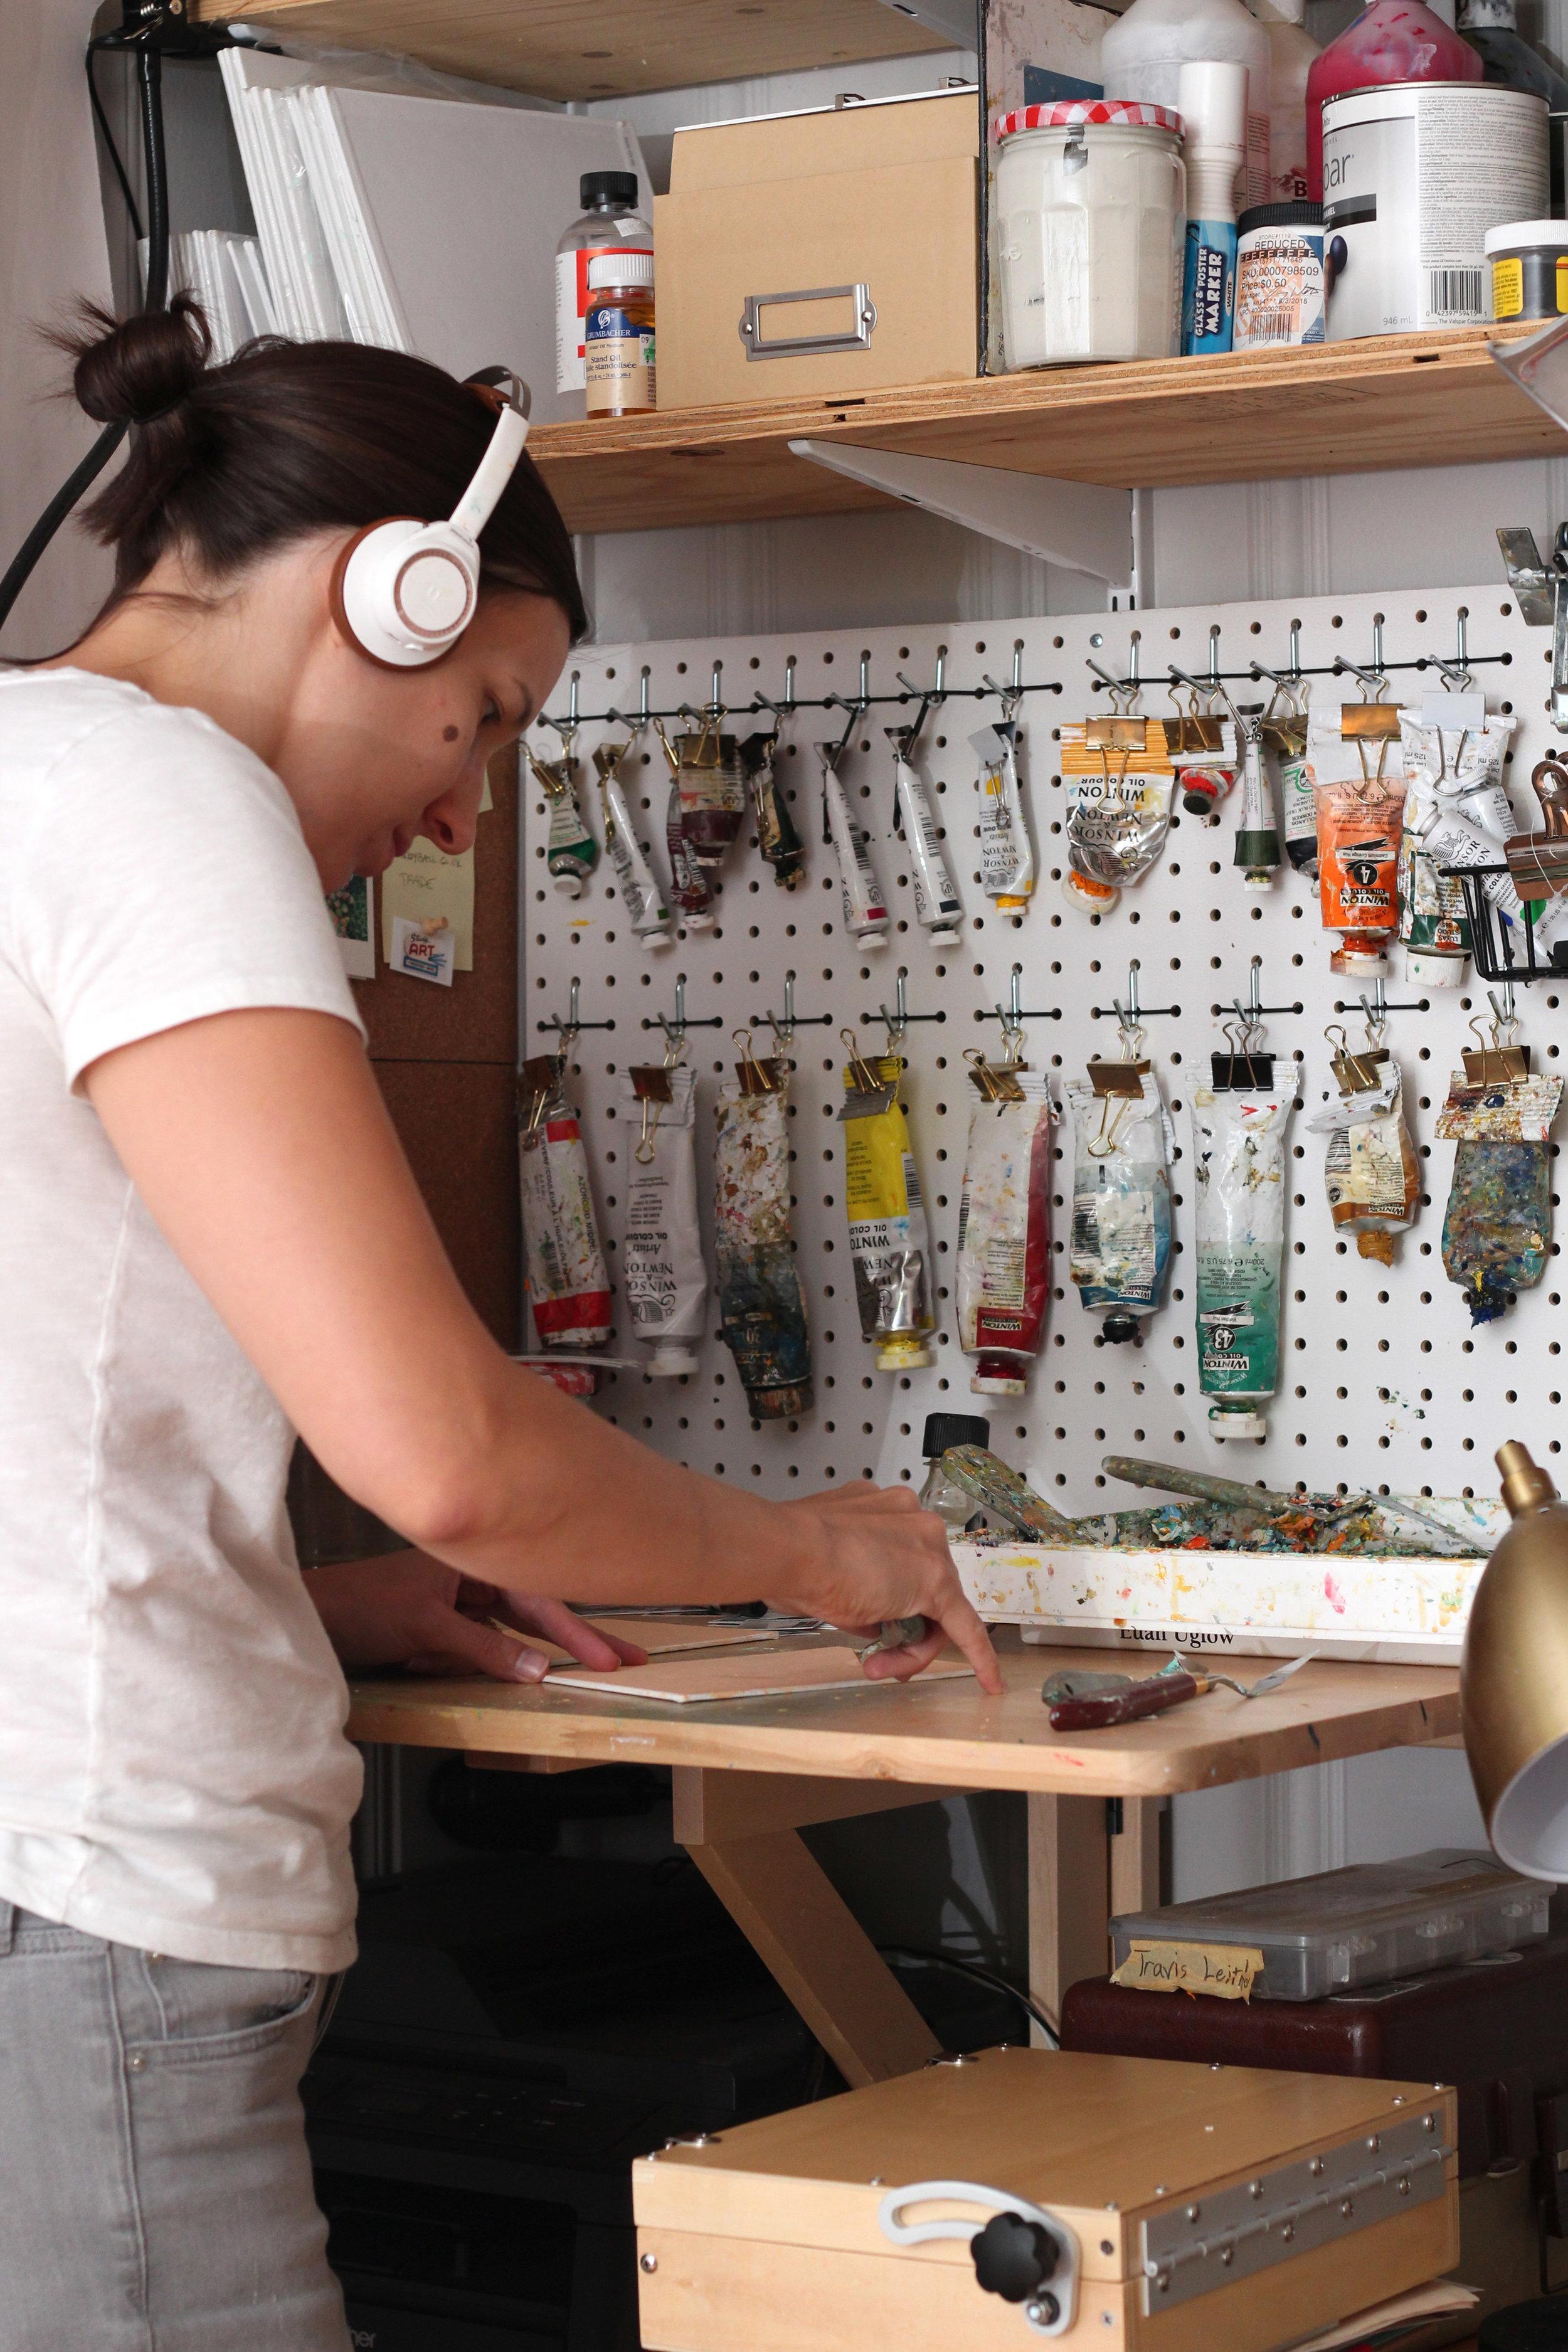 Fields working in her studio